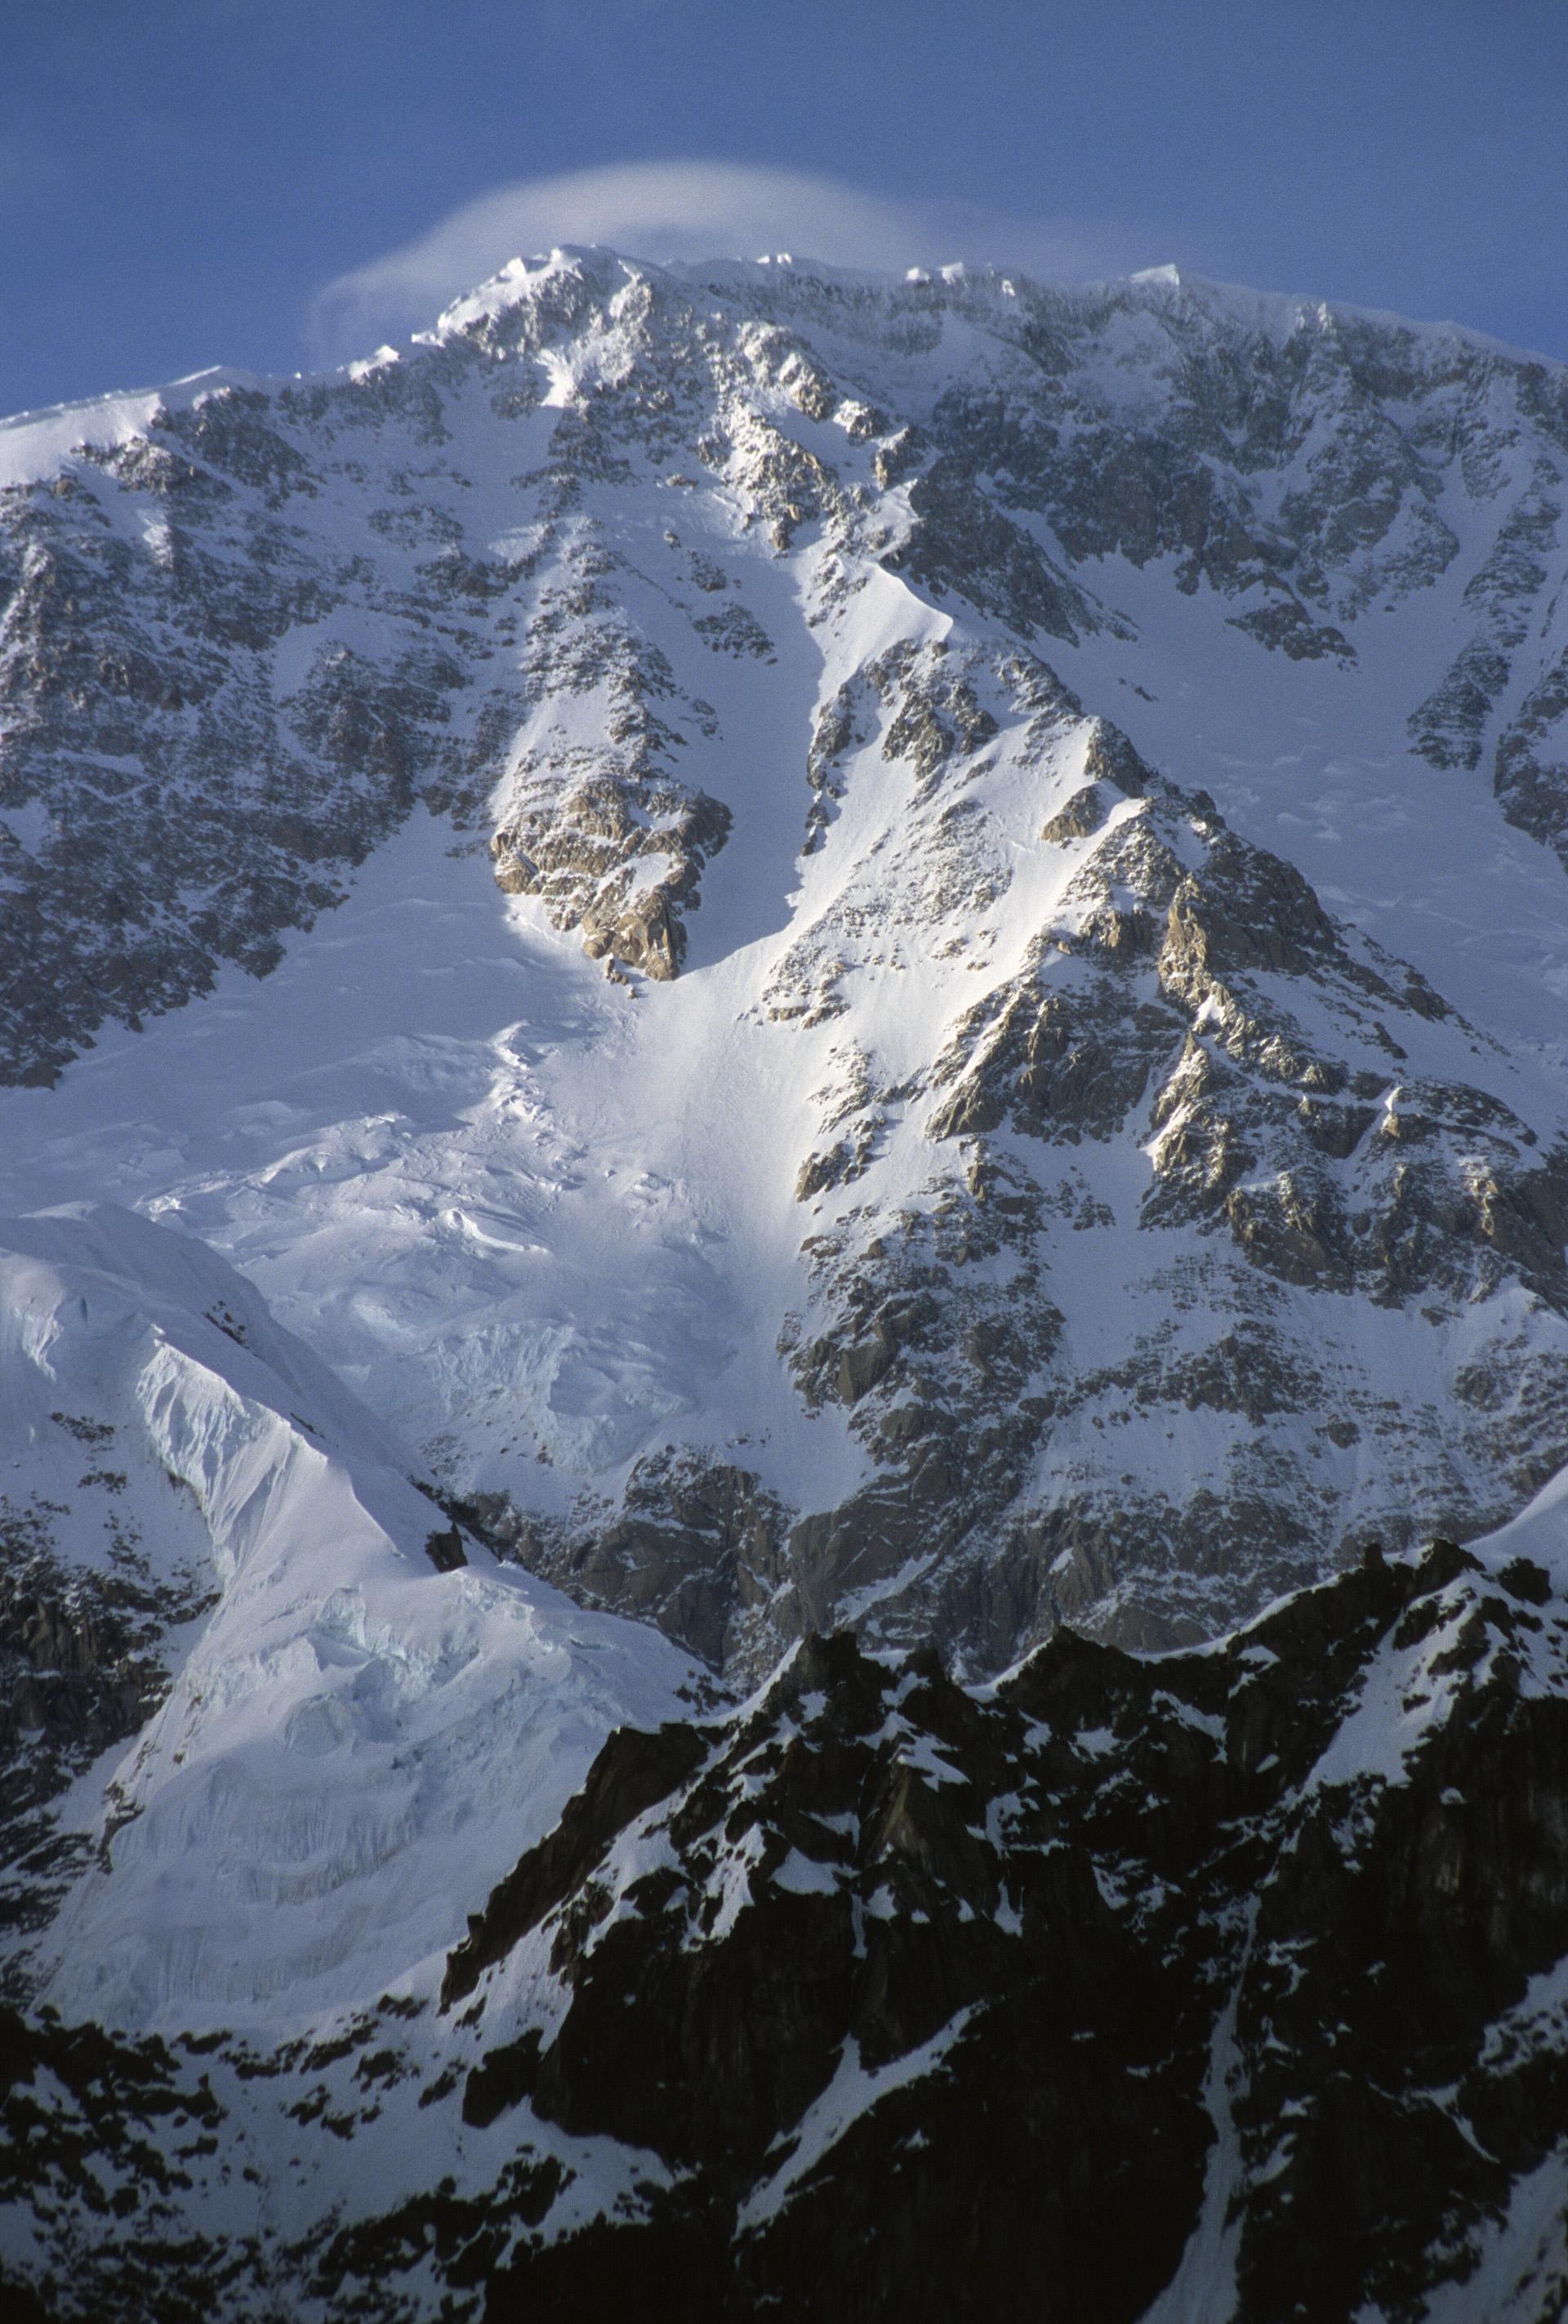 Denali 20,320 ft Cassin Ridge